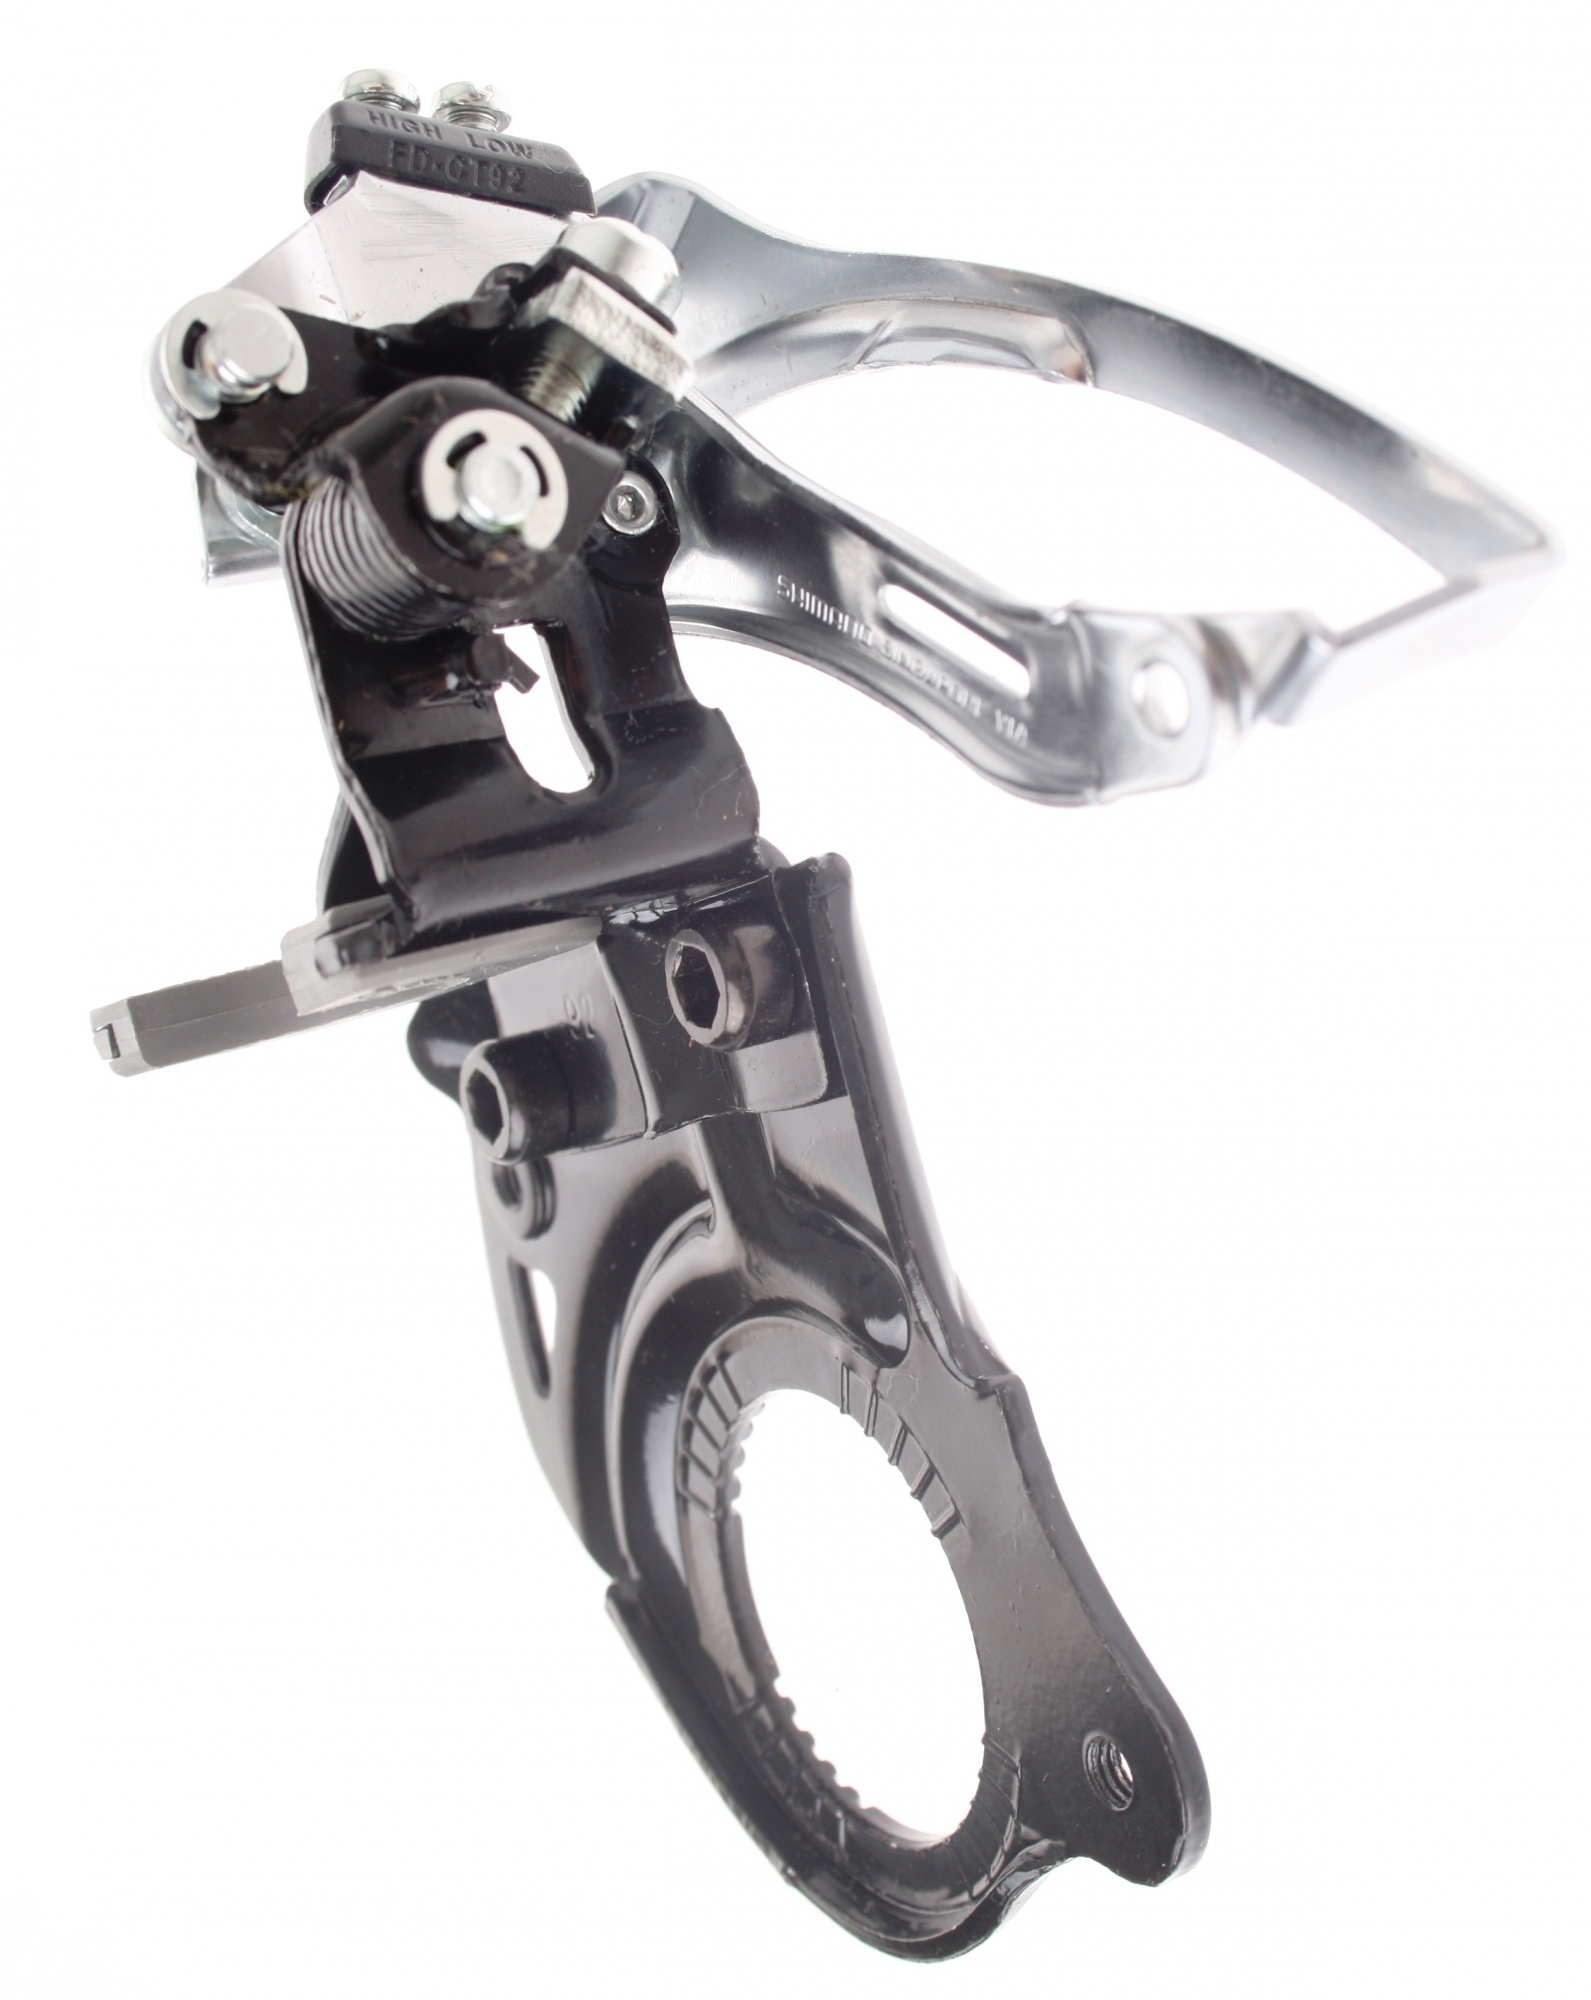 Shimano Front Derailleur Altus Top Pull - Internet-Bikes